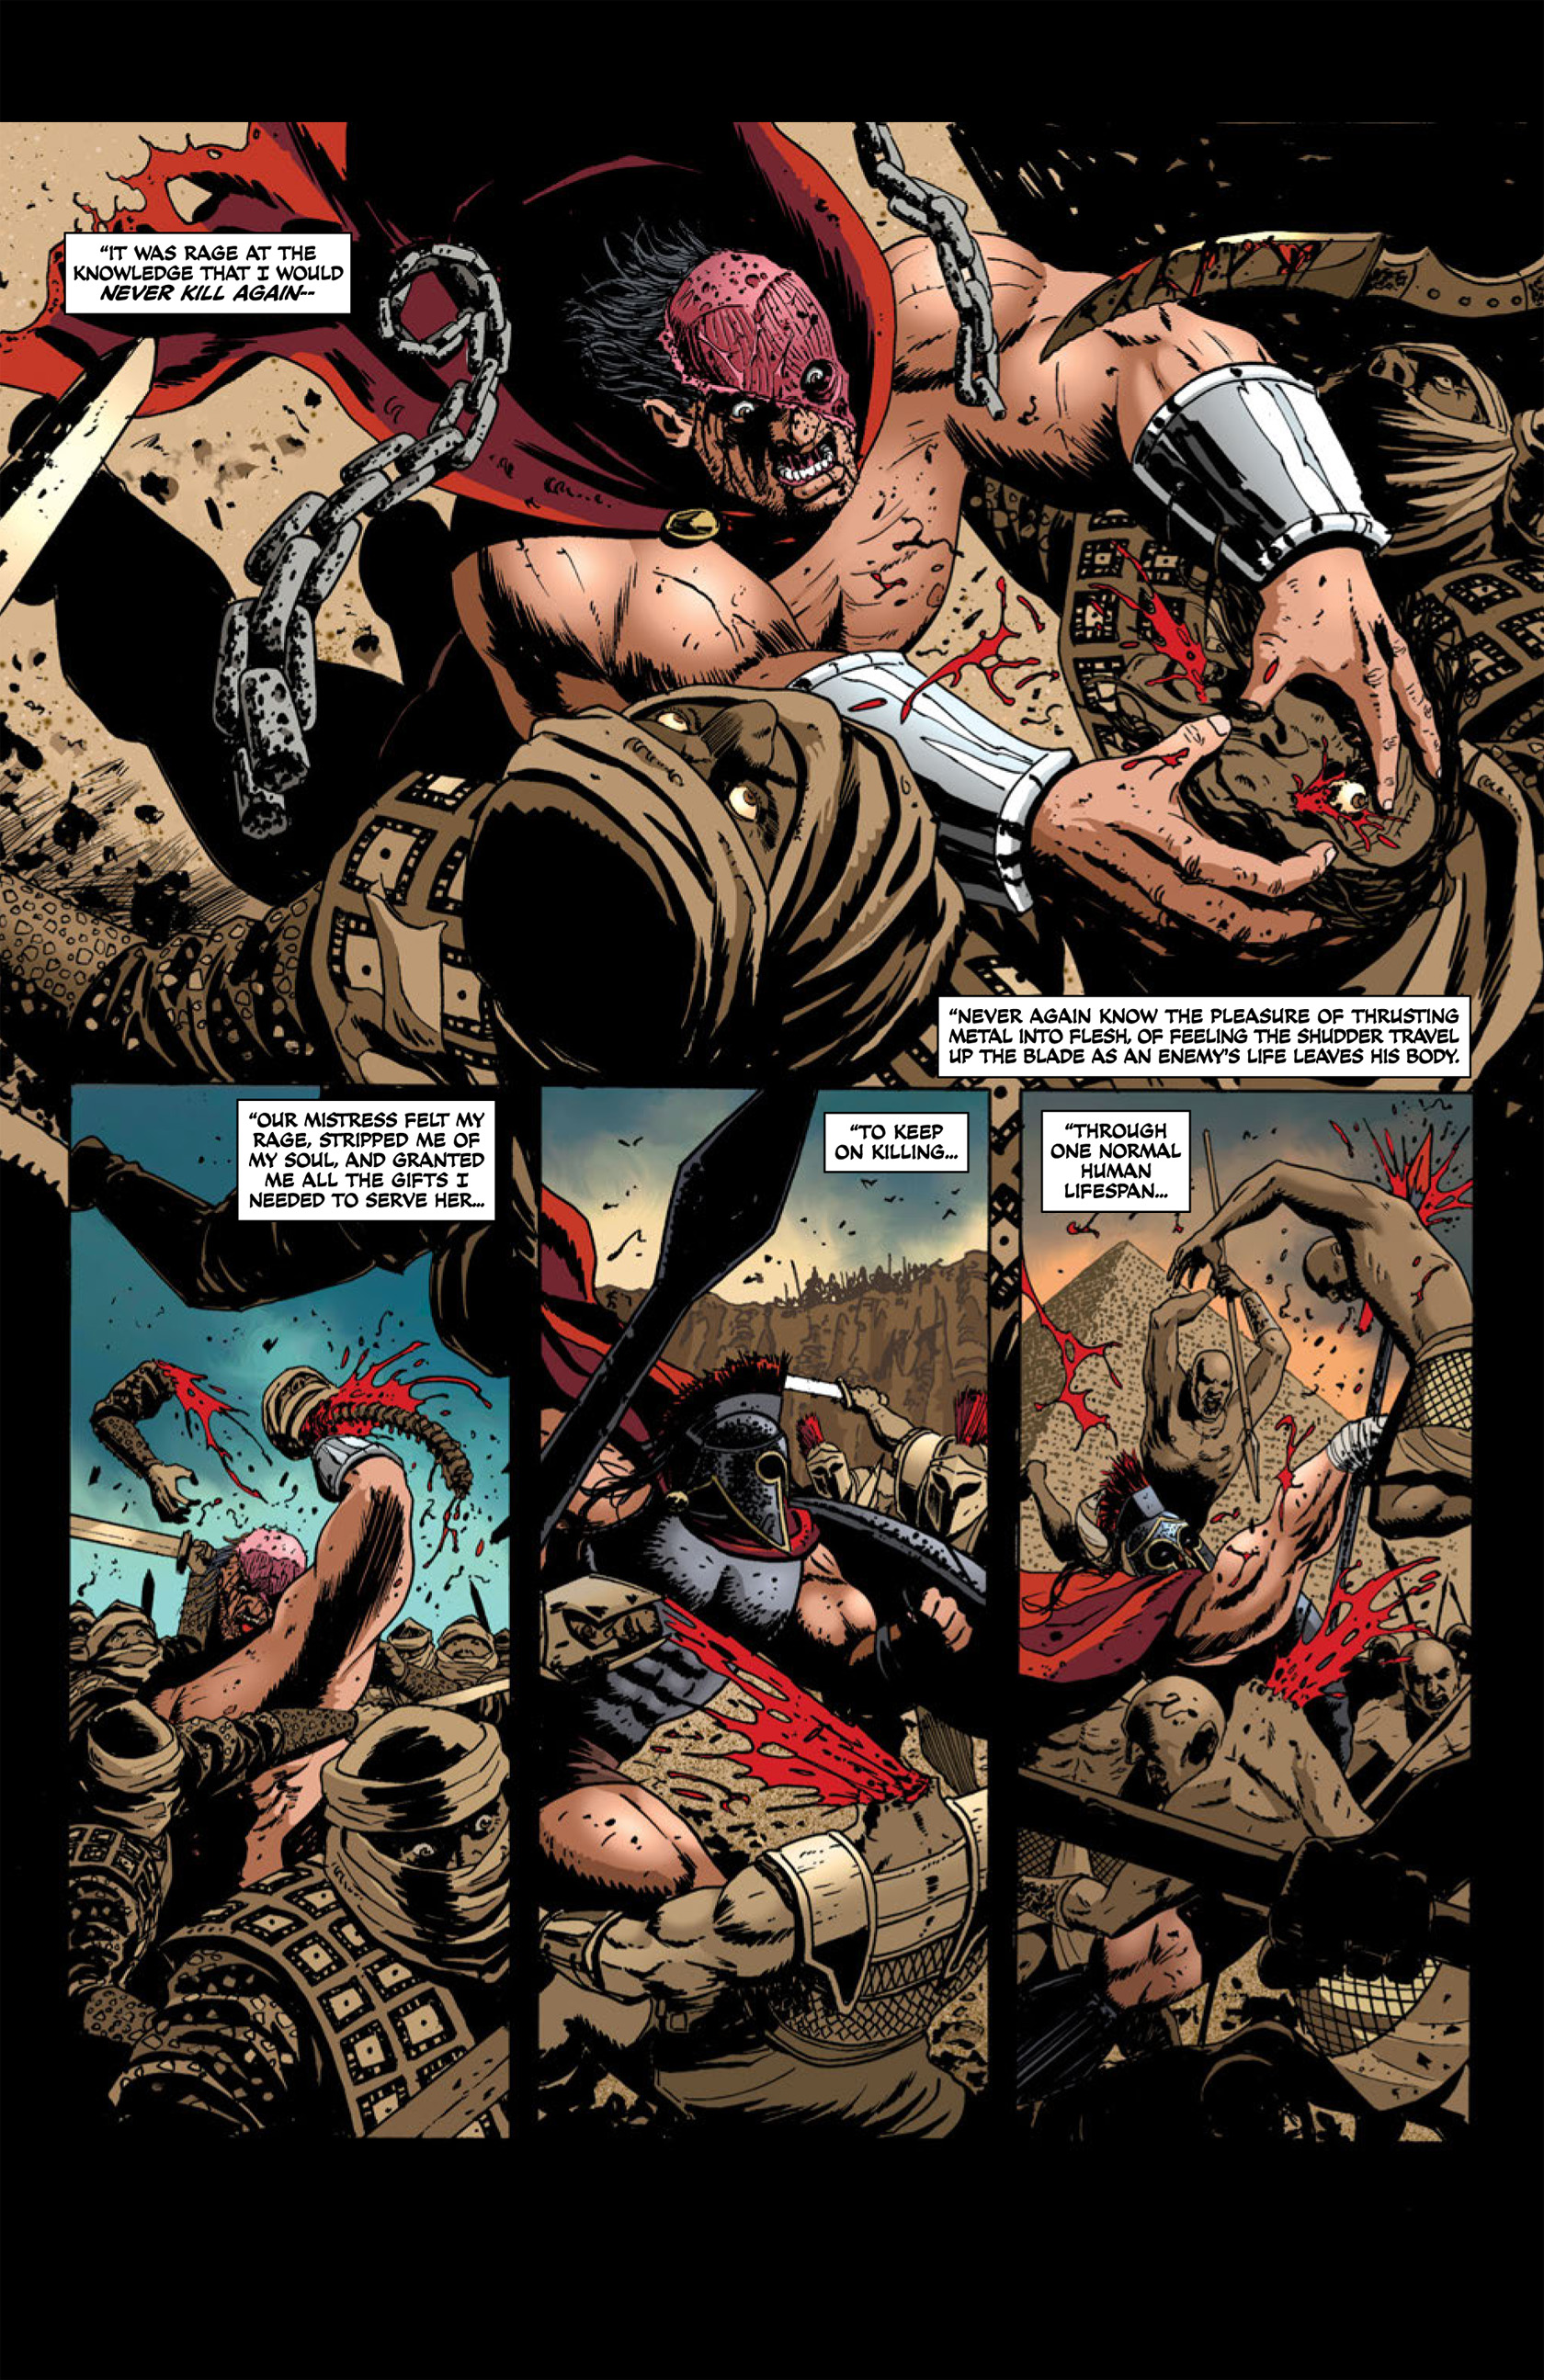 Read online Aquila comic -  Issue #2 - 5